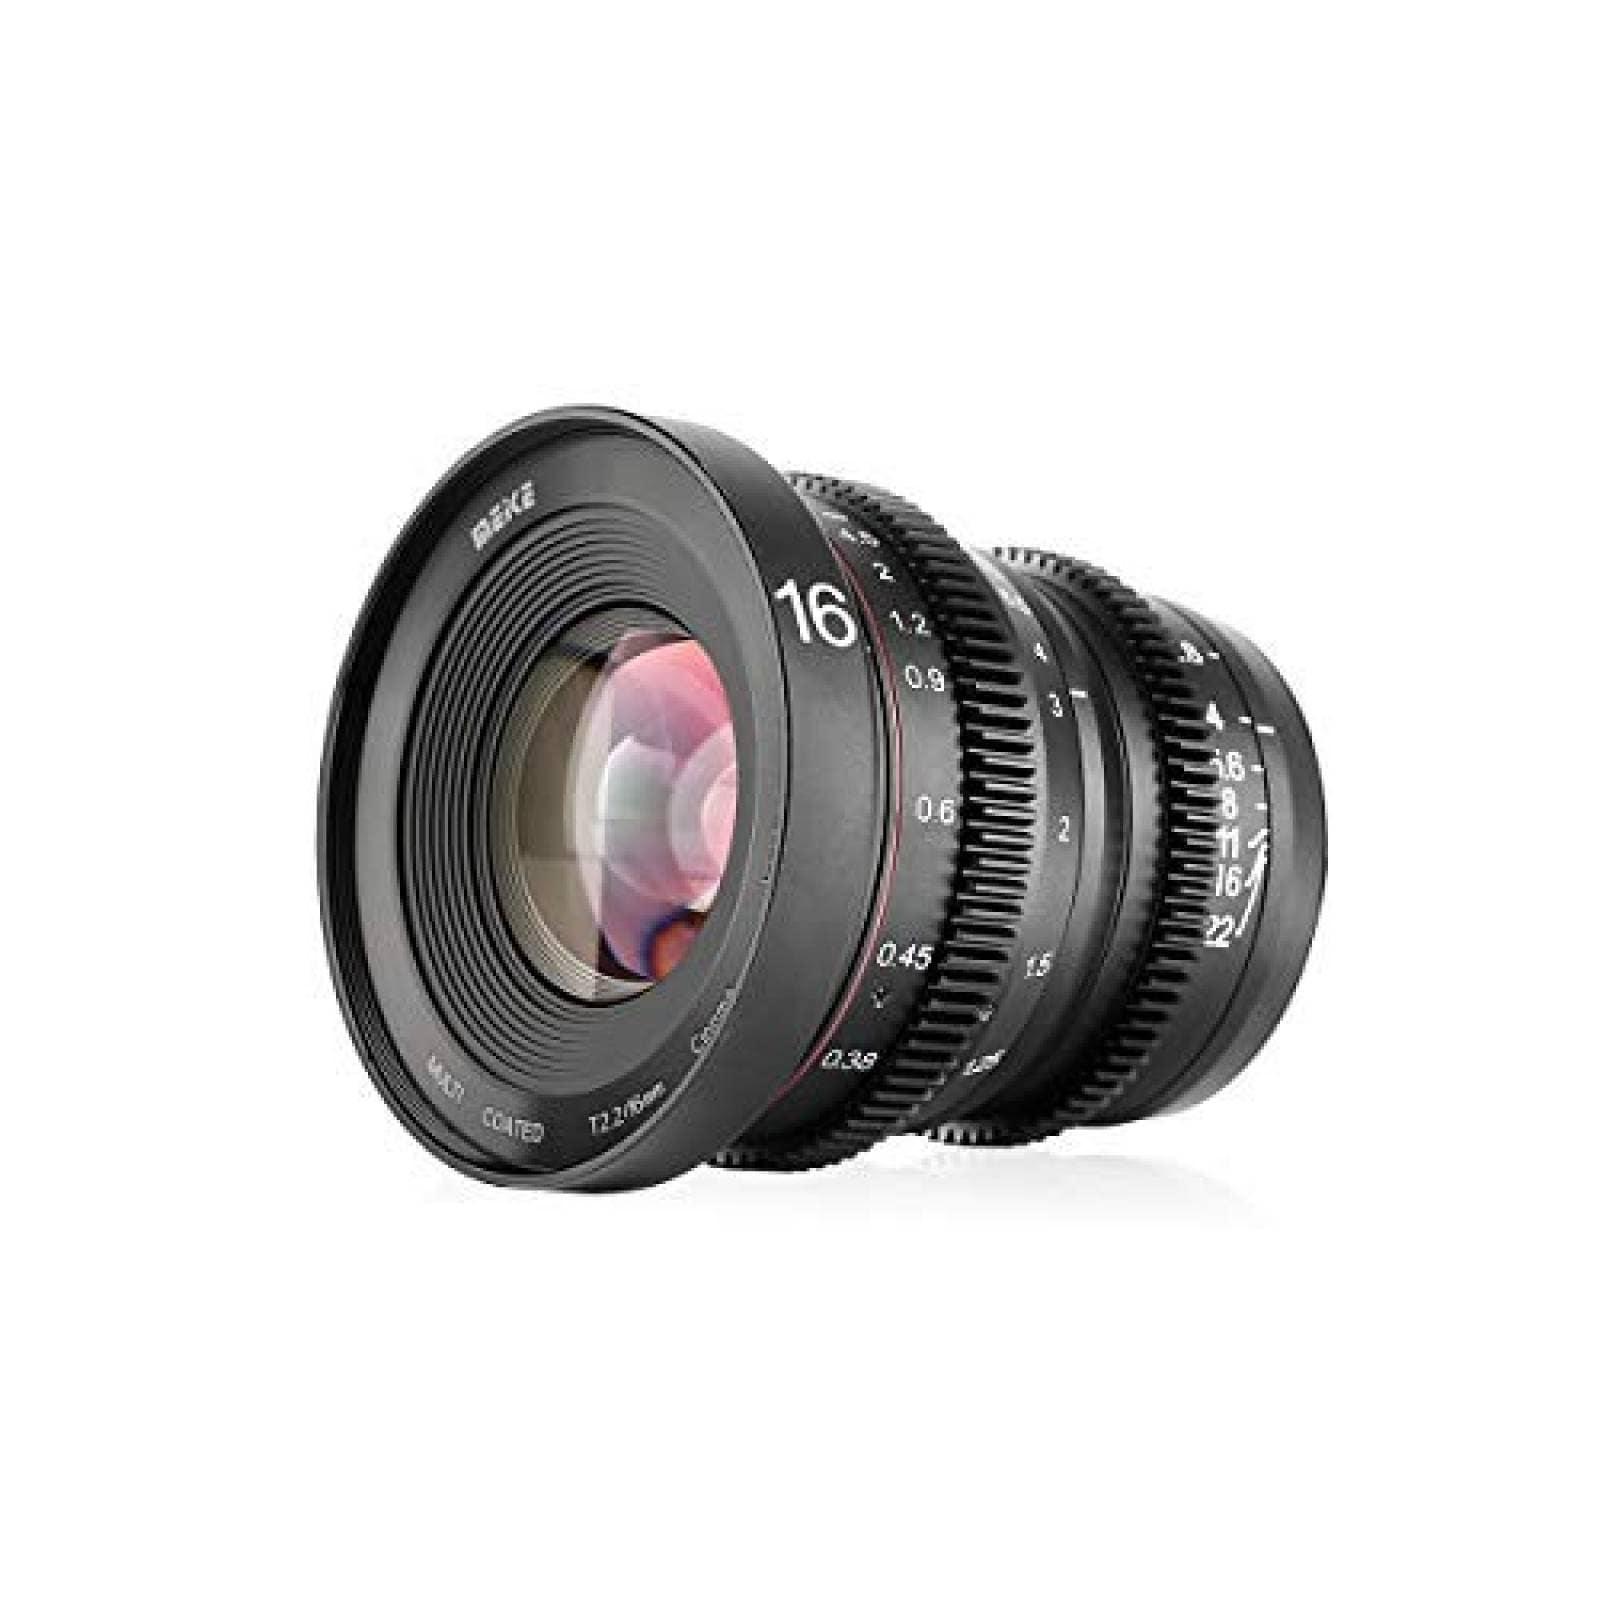 Lente de cámara Meike 16mm T2.2 cámara Panasonic Lumix negro